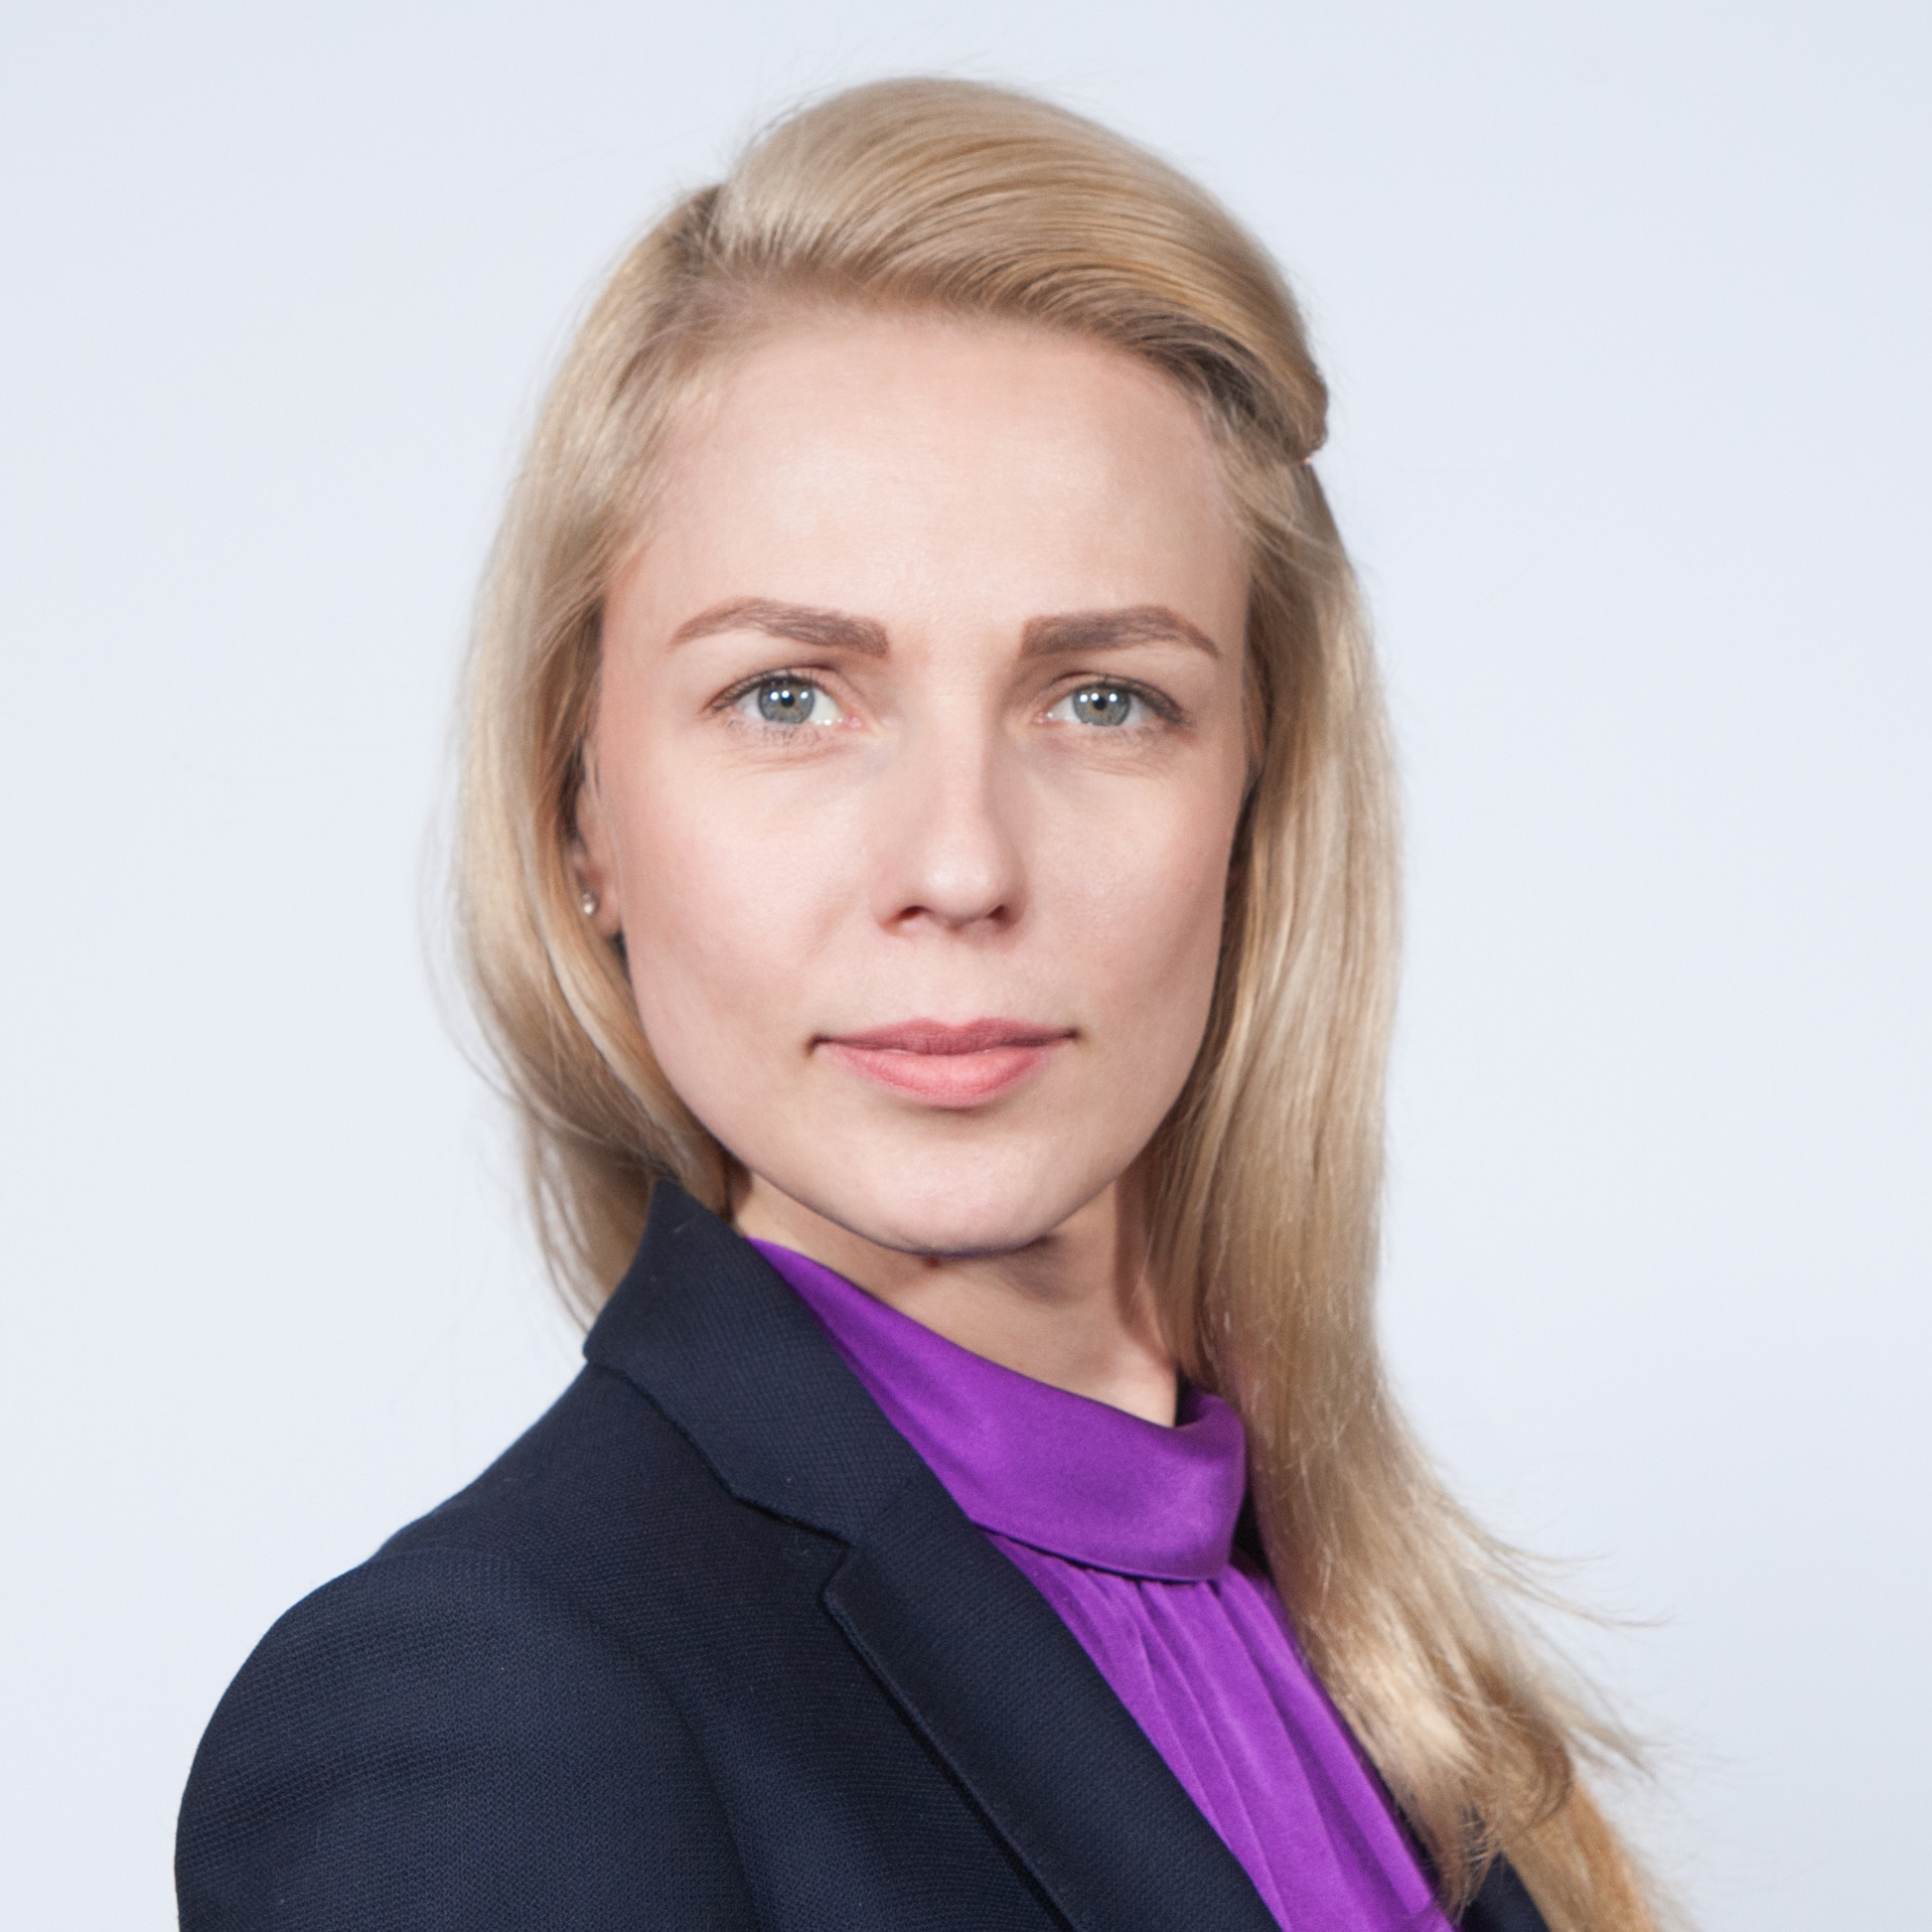 Качанова Анна Алексеевна